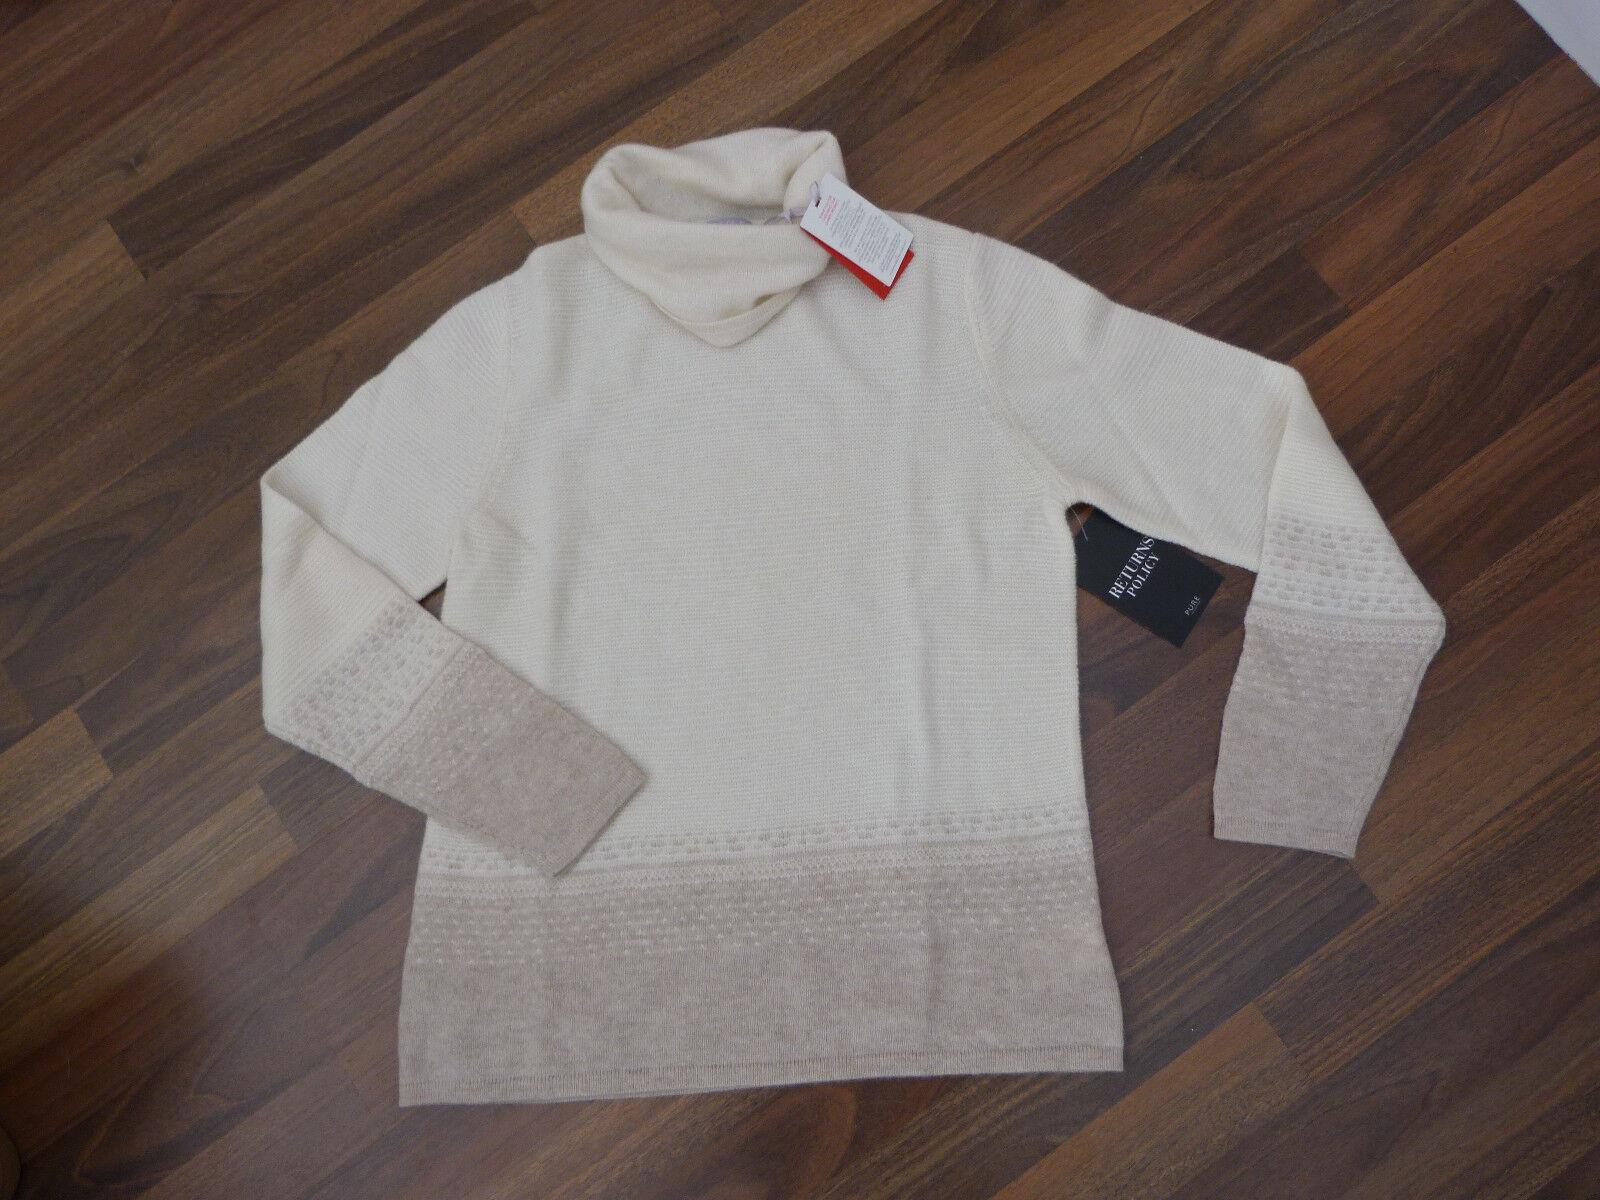 BNWT Pure Collection Gassato cashmere Natural white polo sweater sz 16